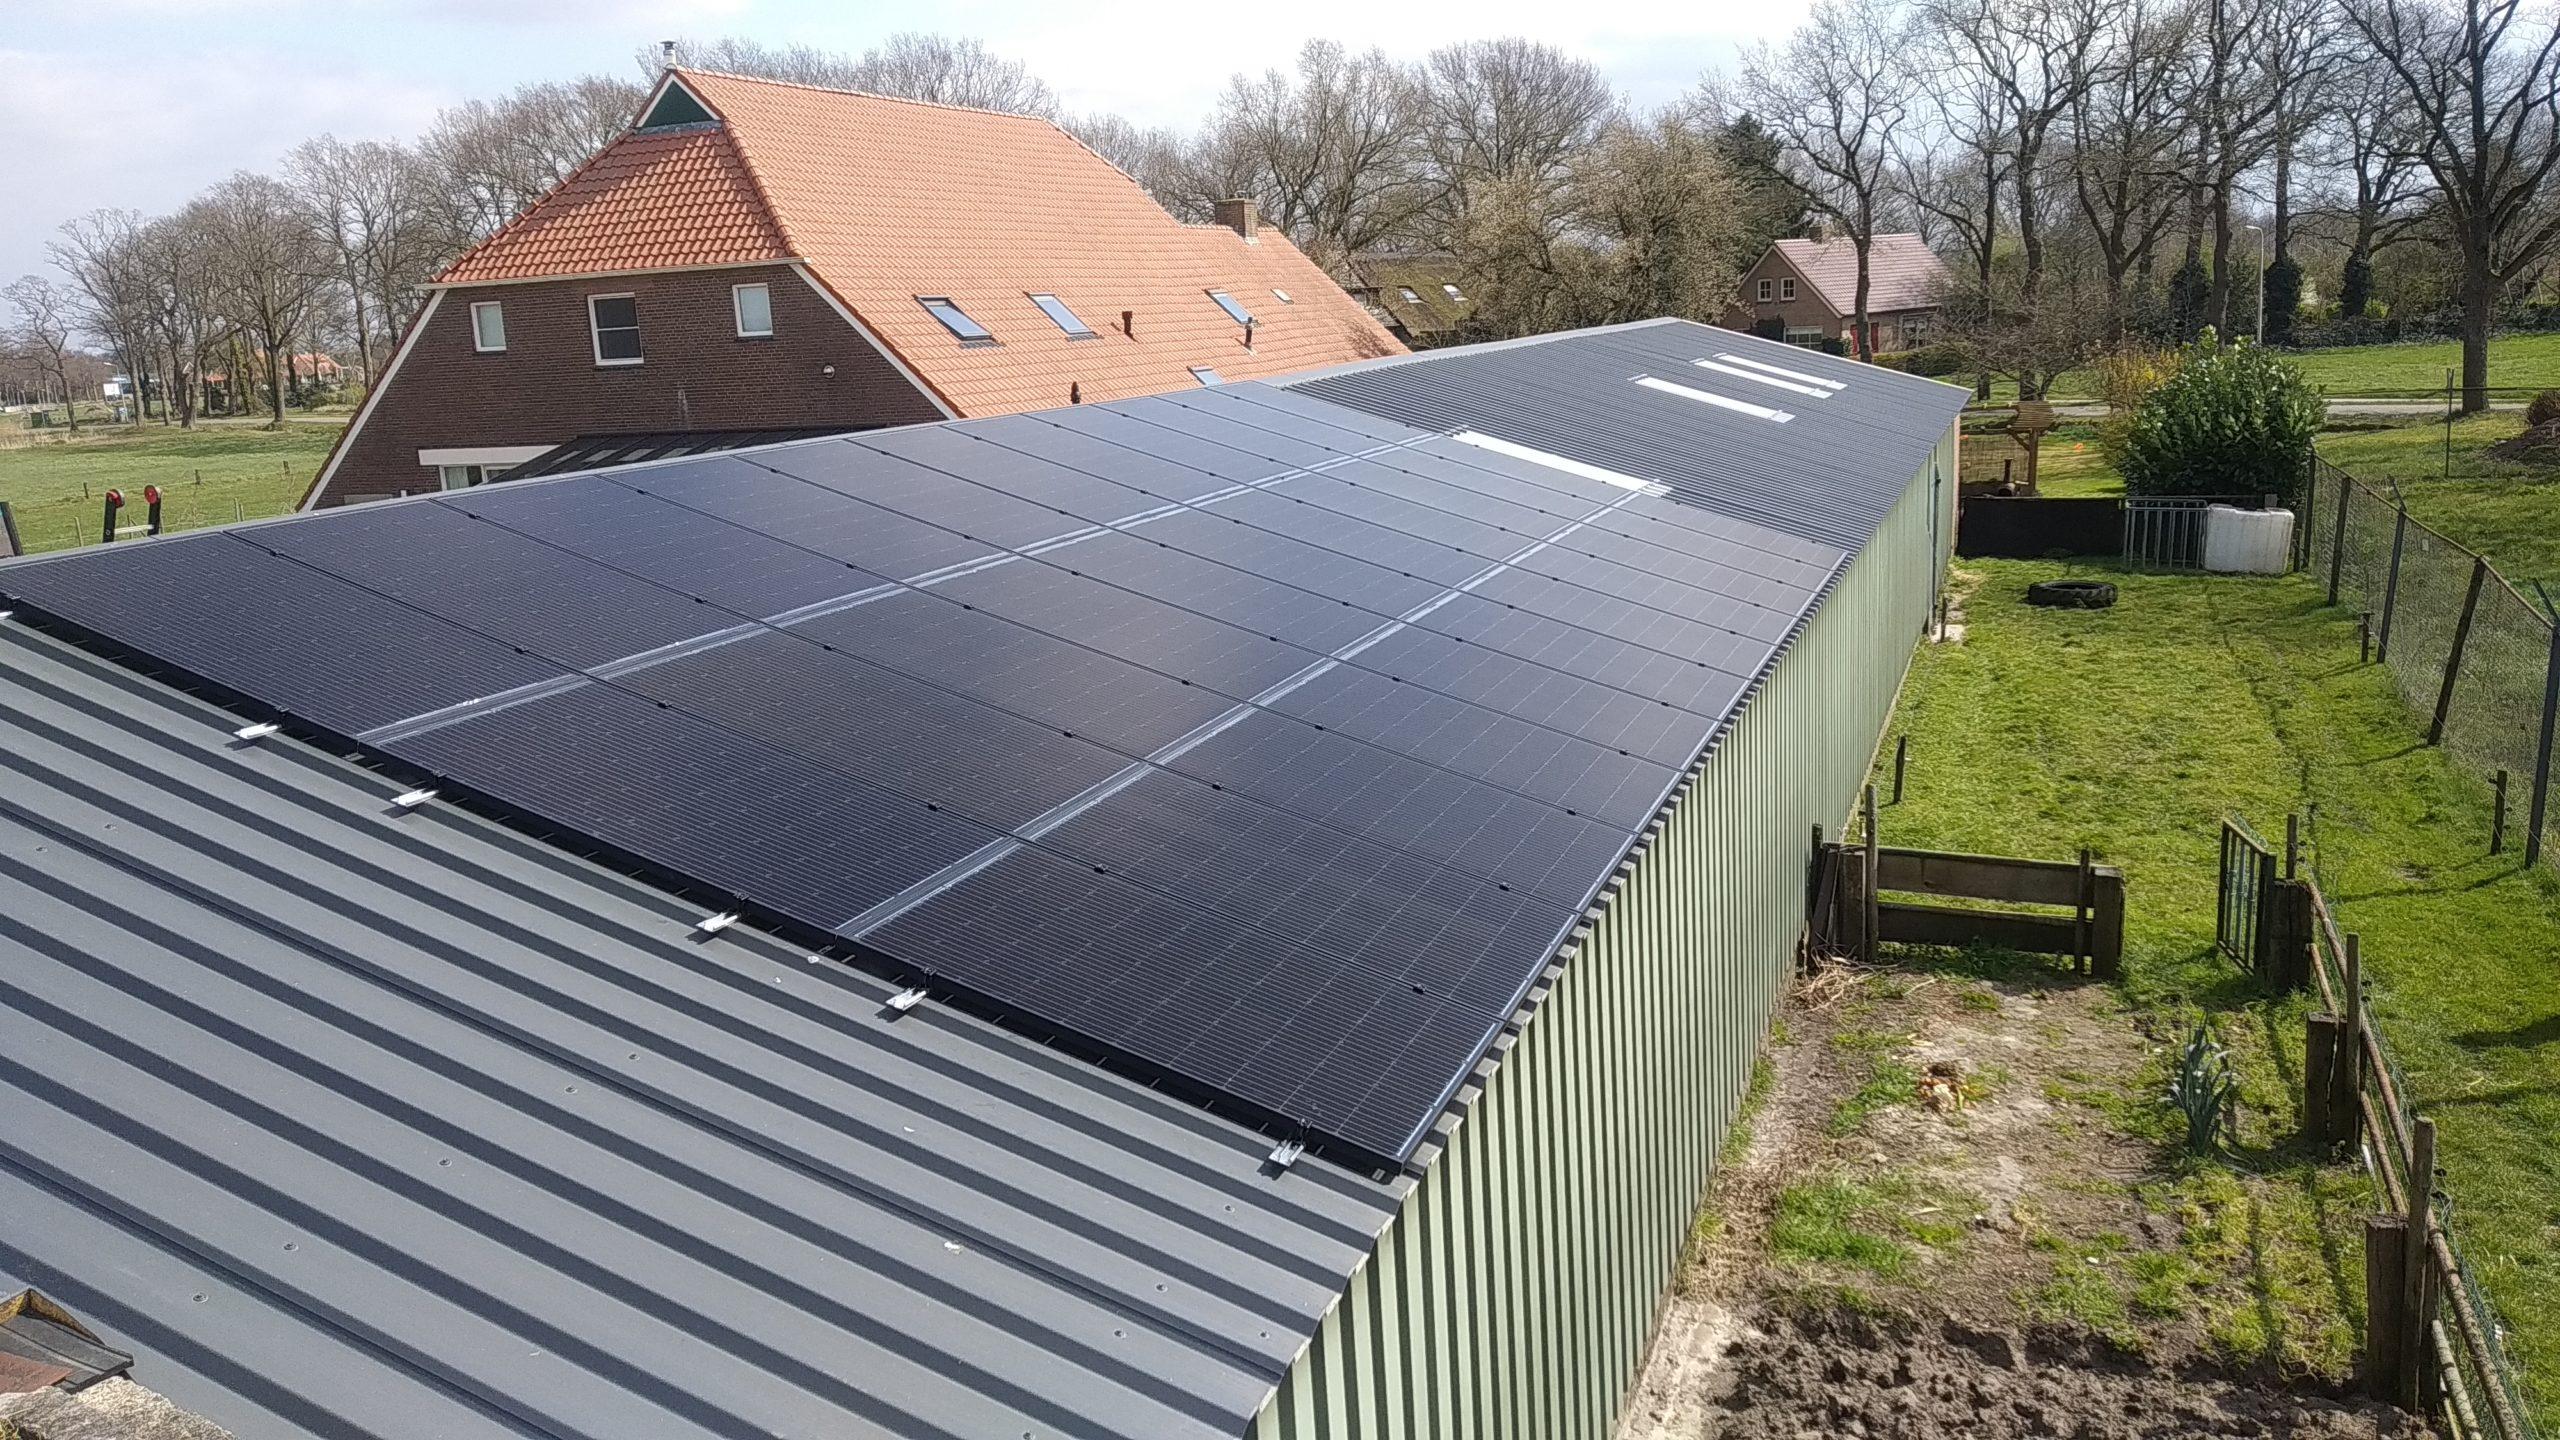 Solarwatt glas-glas zonnepanelen Echten